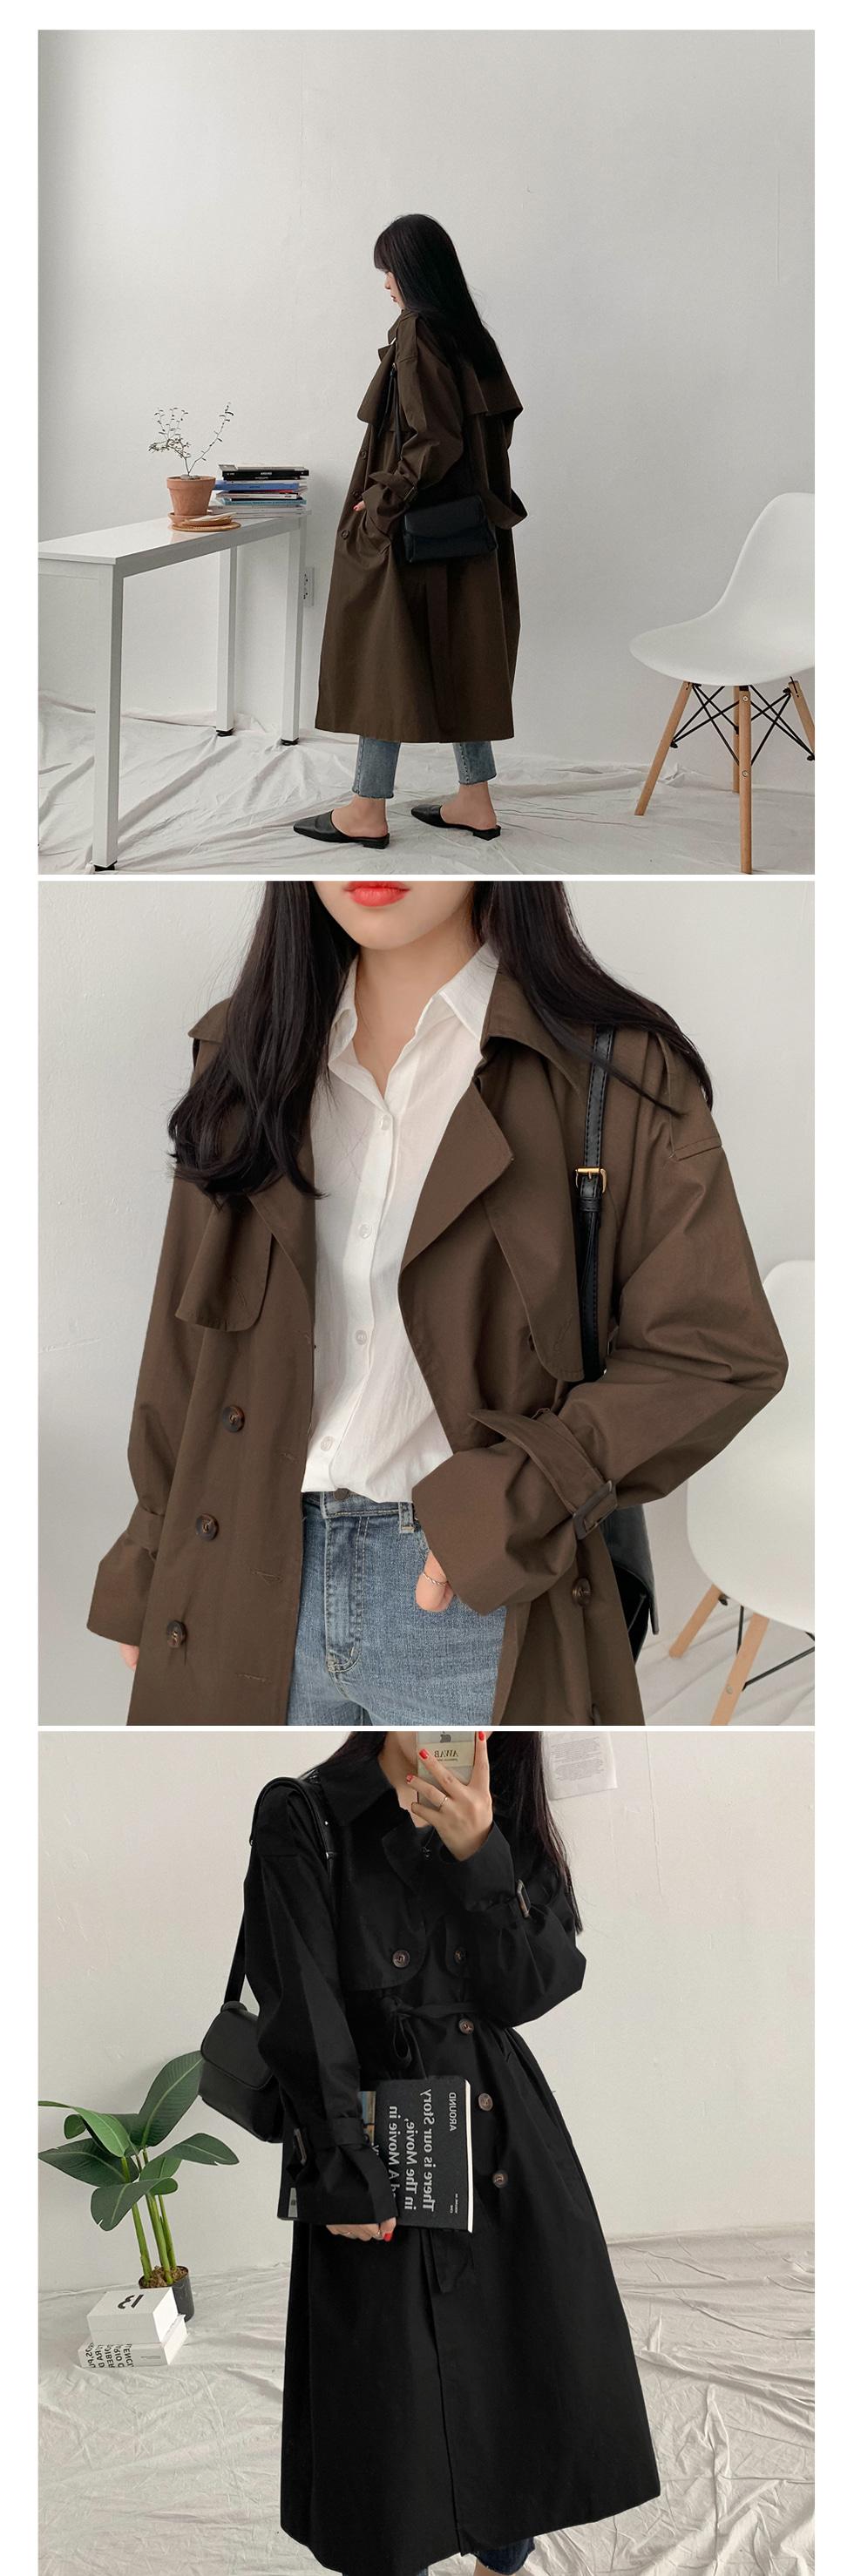 Reversible trench coat